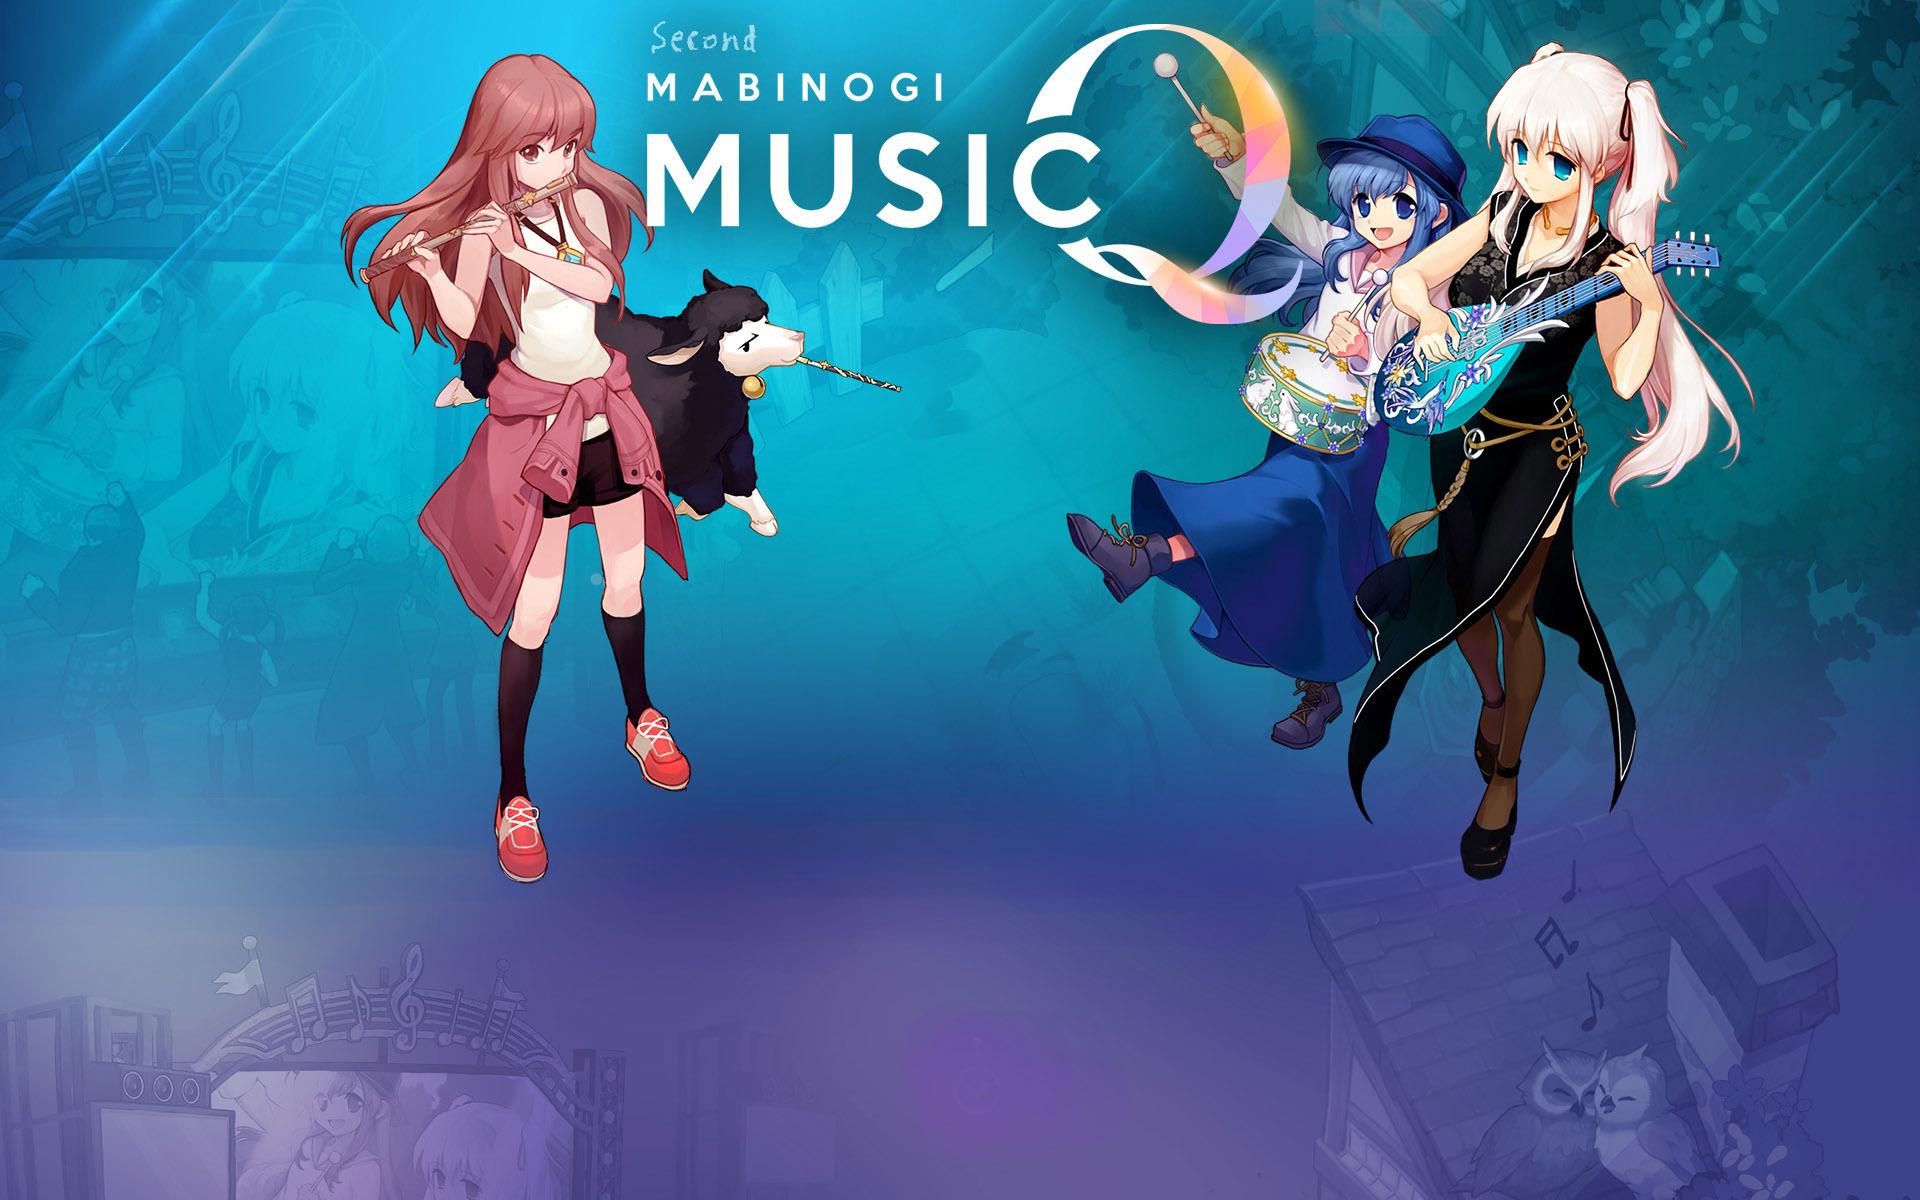 MusicQ-2nd壁紙-1